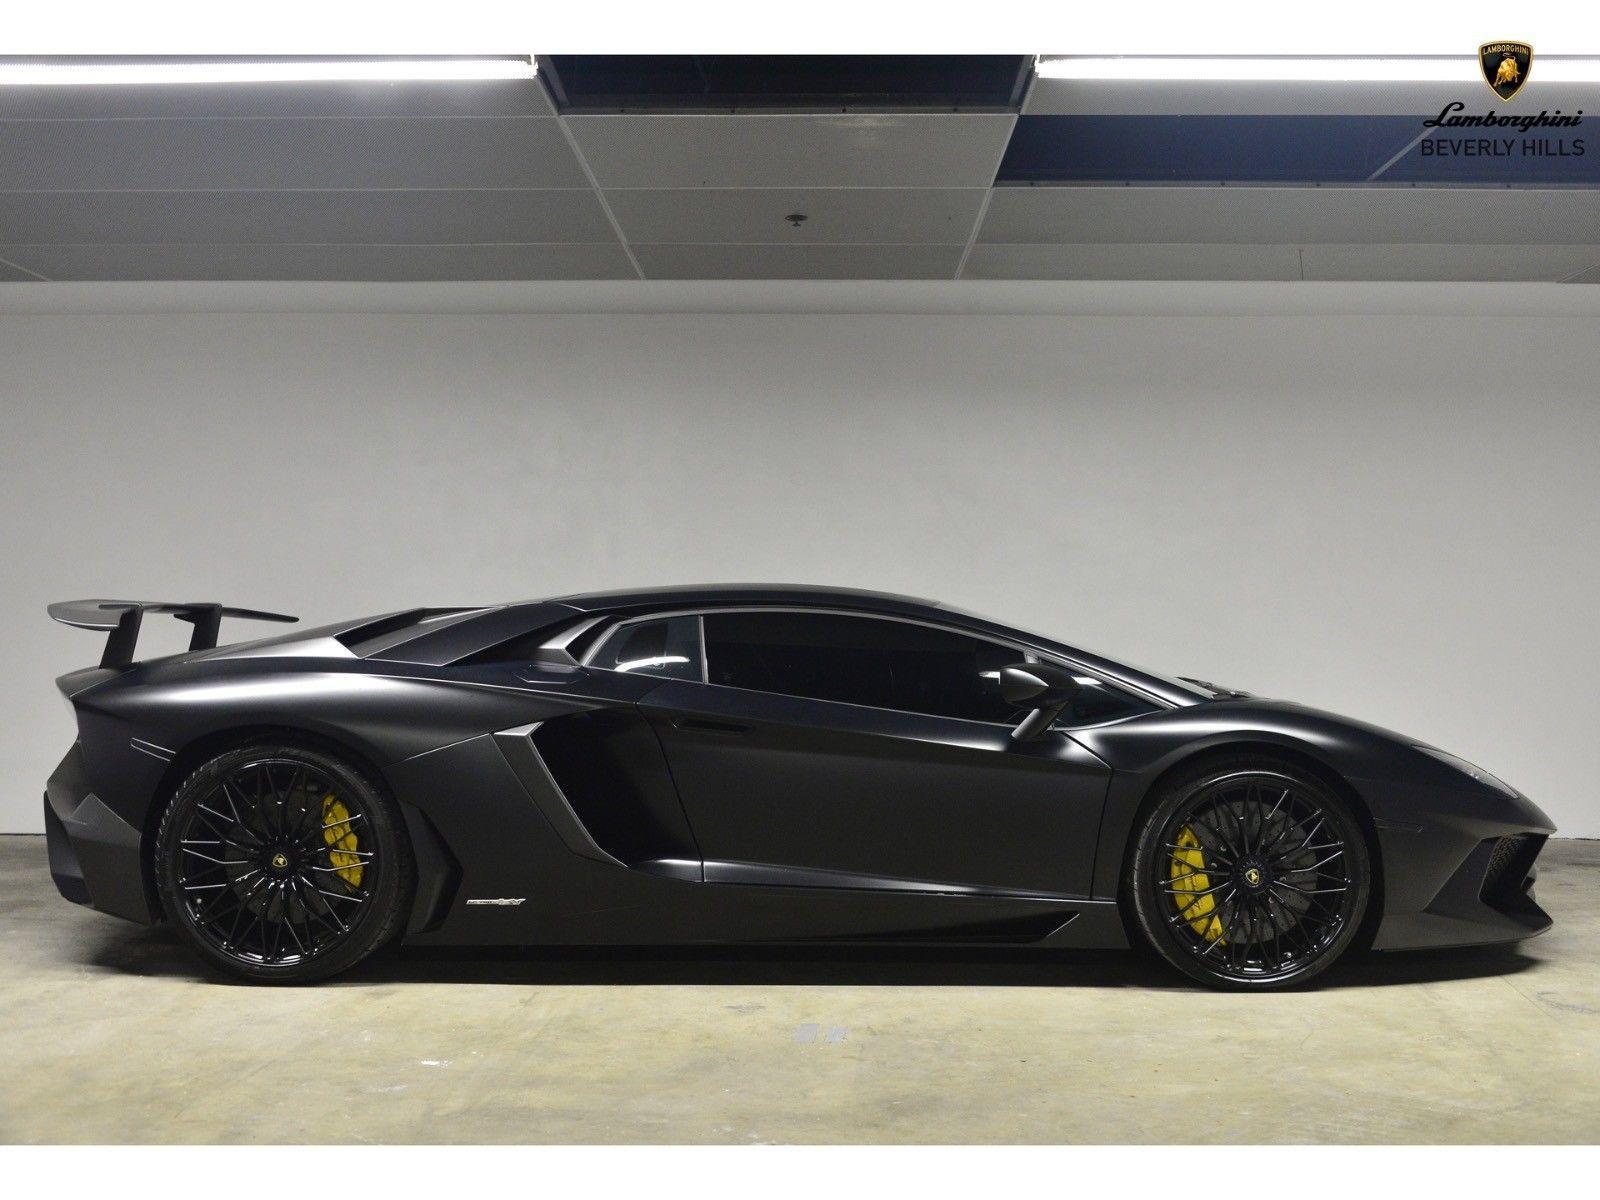 Amazing 2016 Lamborghini Aventador 2016 Lamborghini